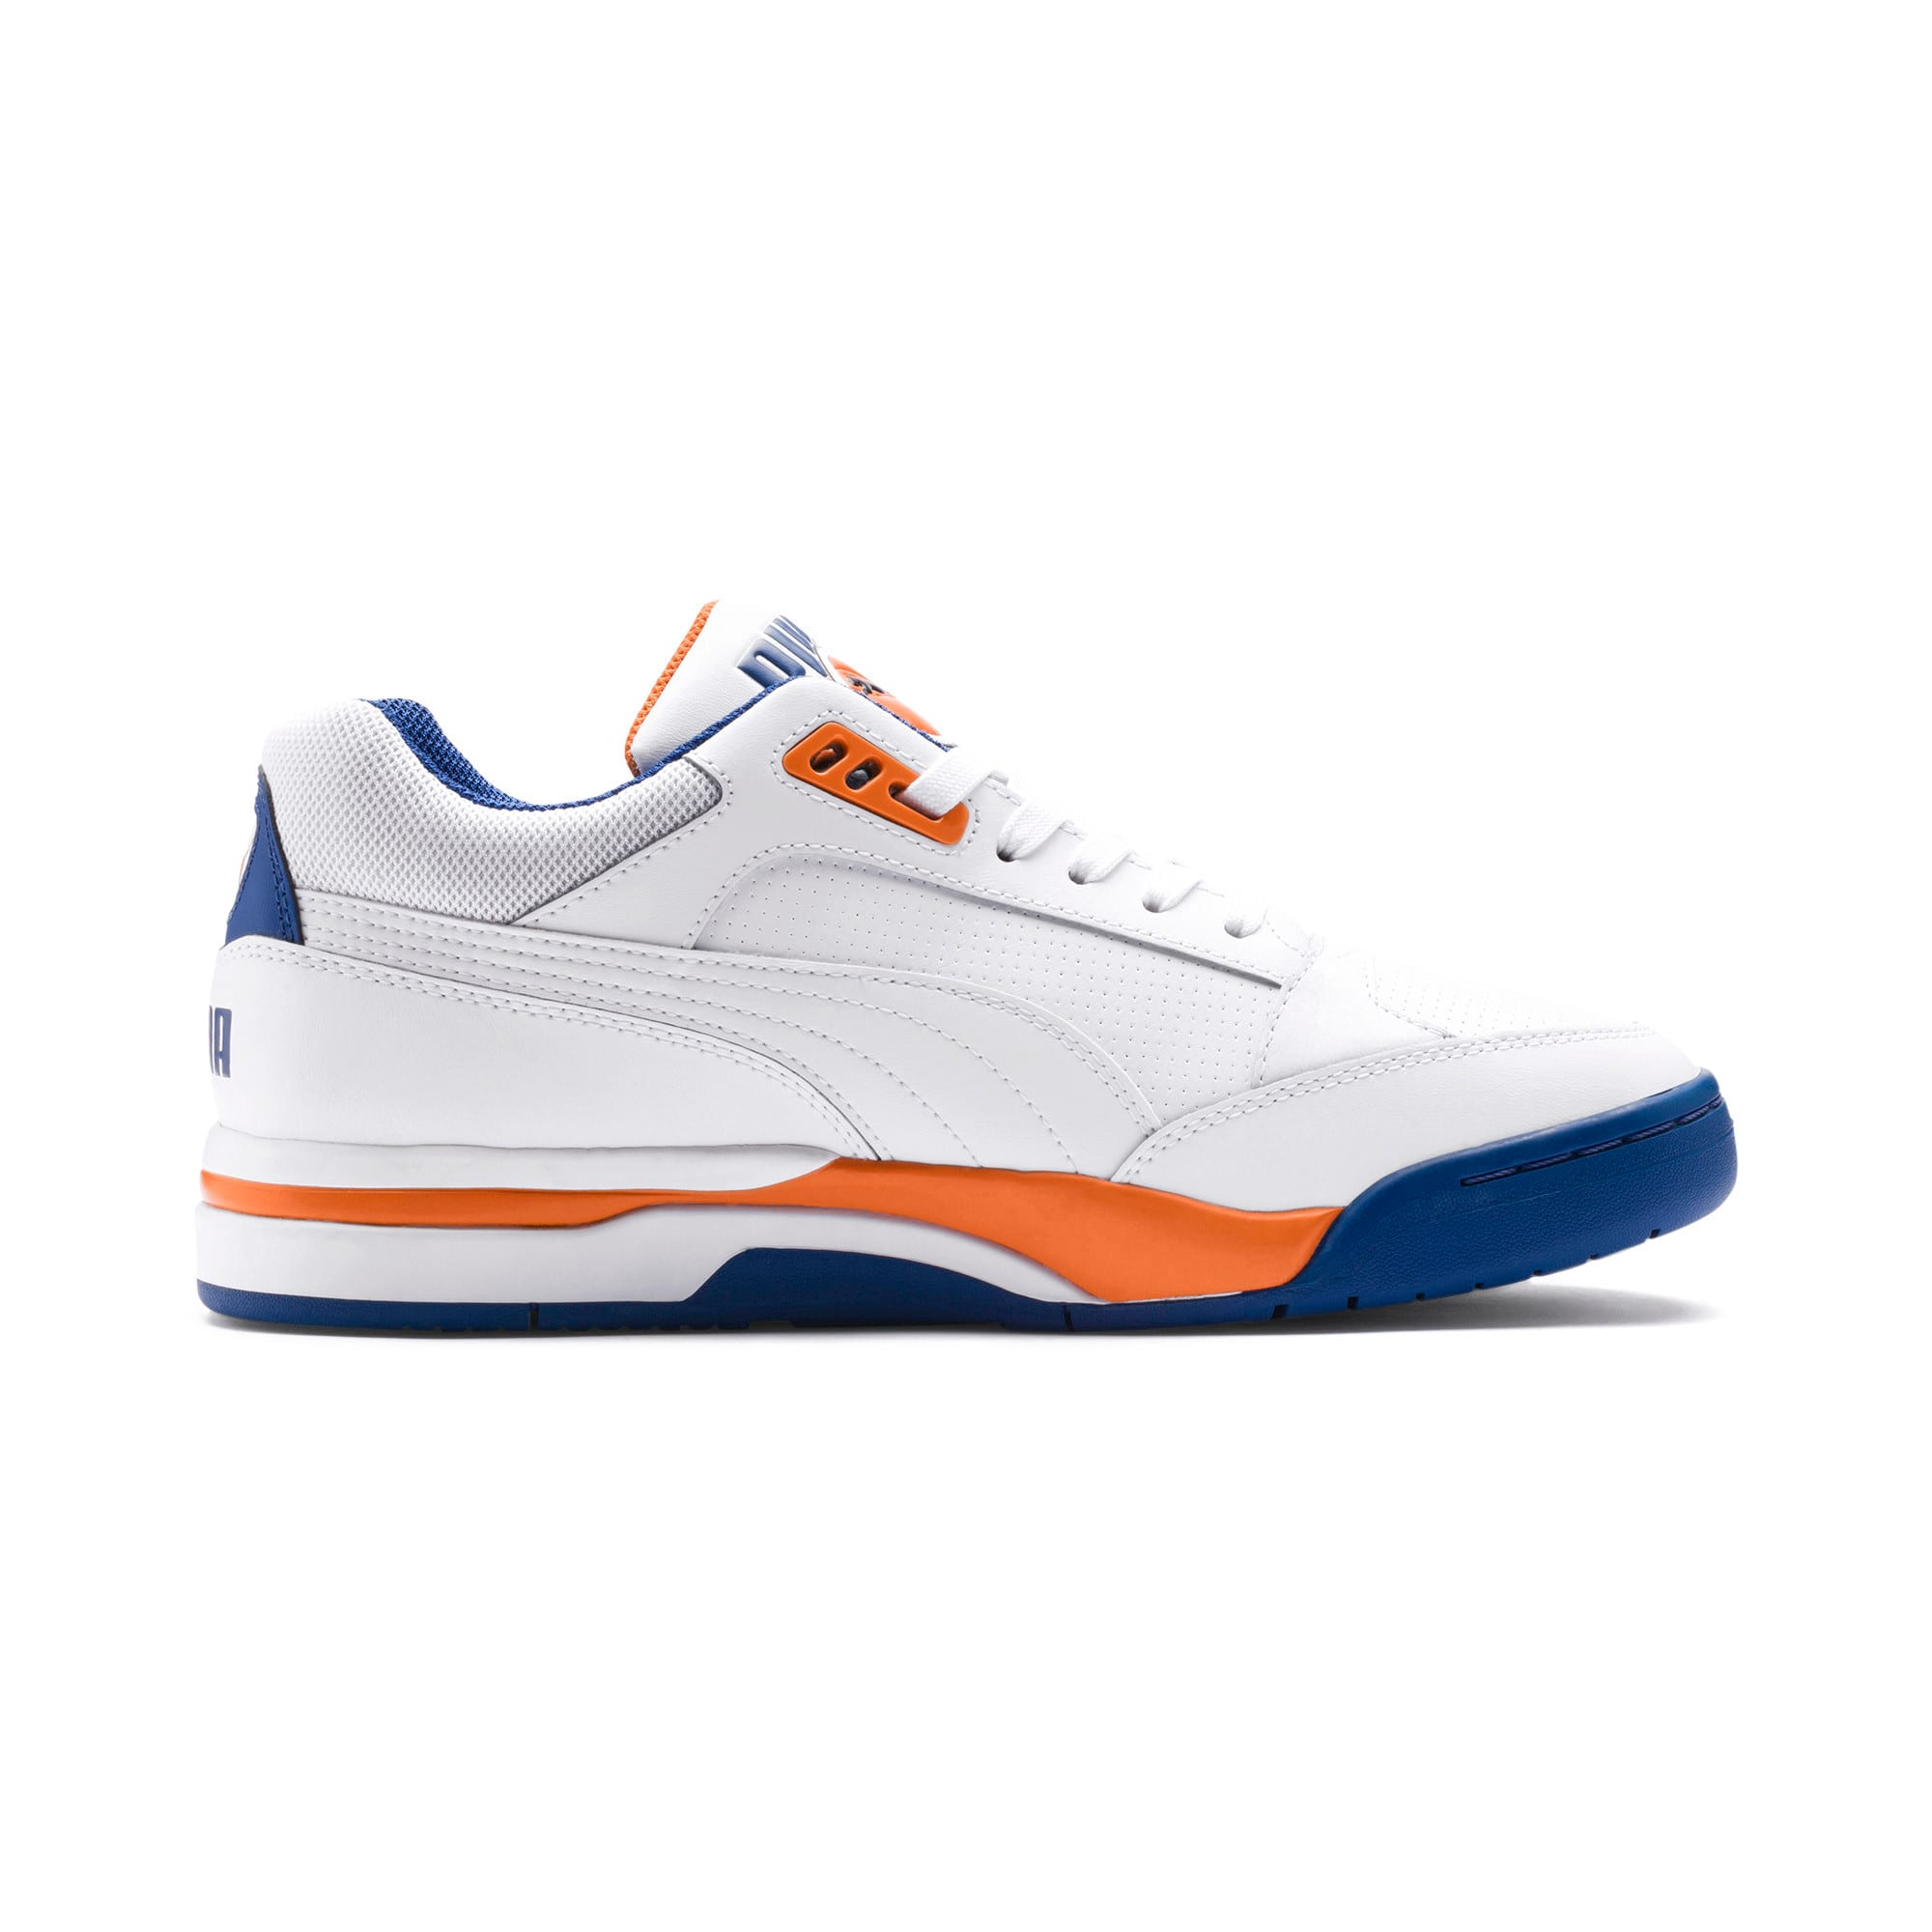 Thumbnail 5 of Palace Guard Sneakers, P White-Jaffa Orange-G Blue, medium